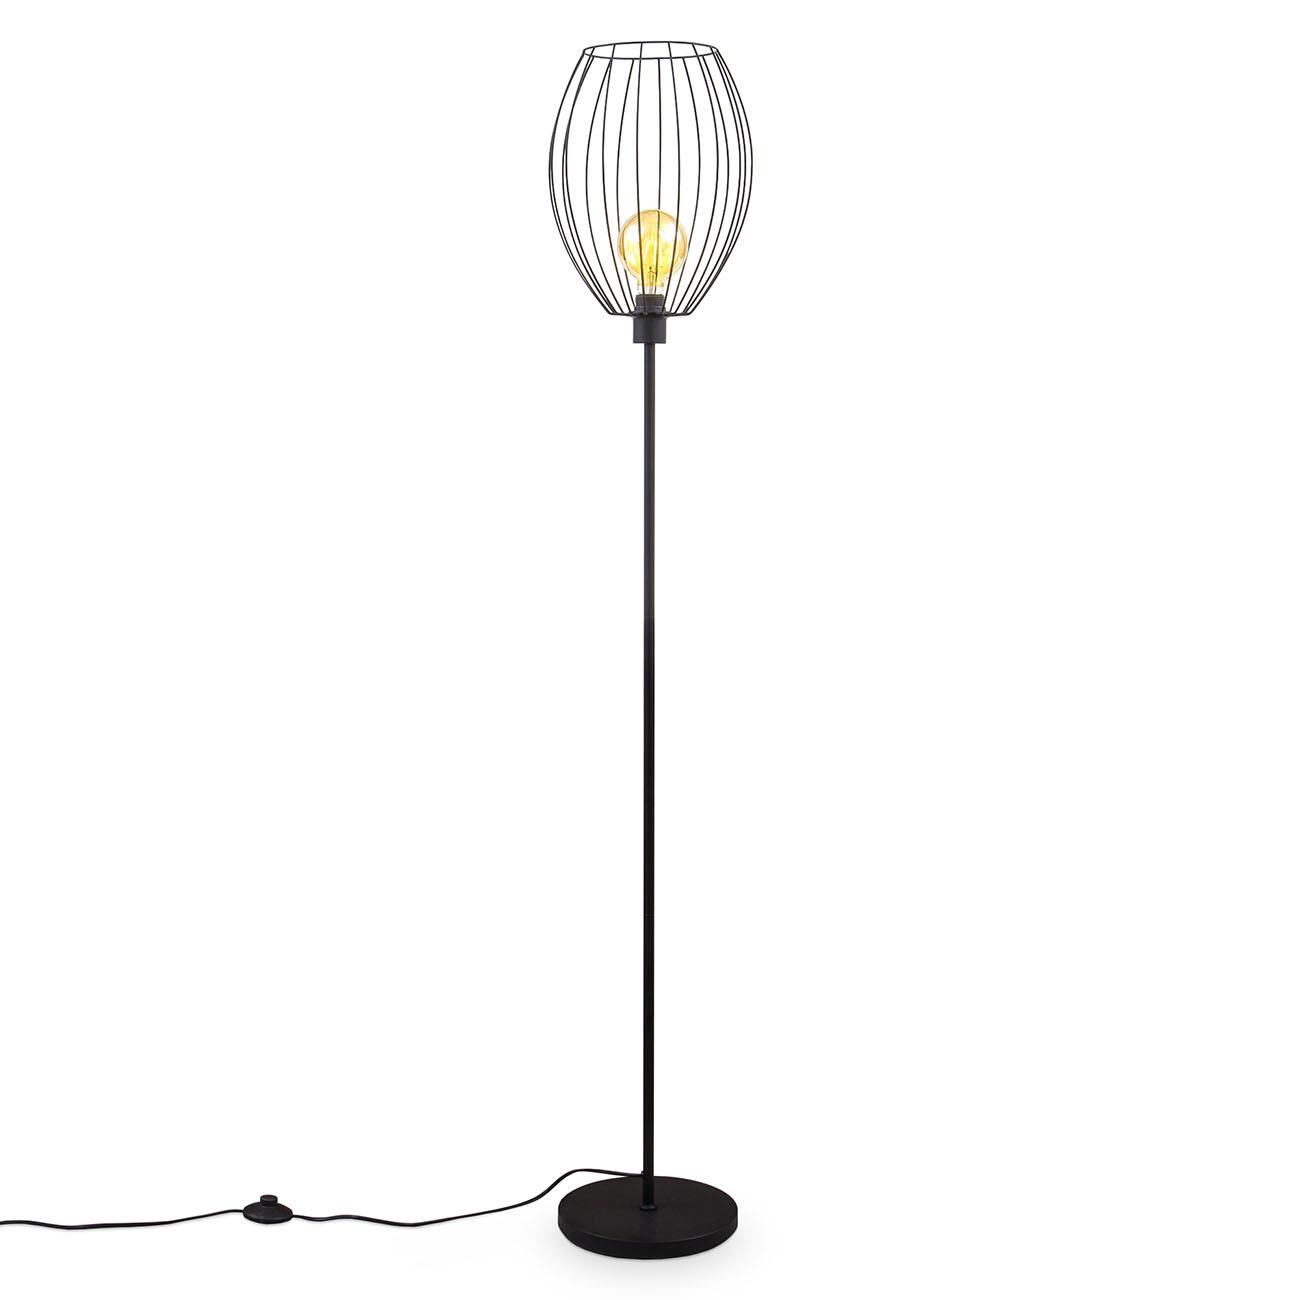 Retro Stehlampe schwarz E27